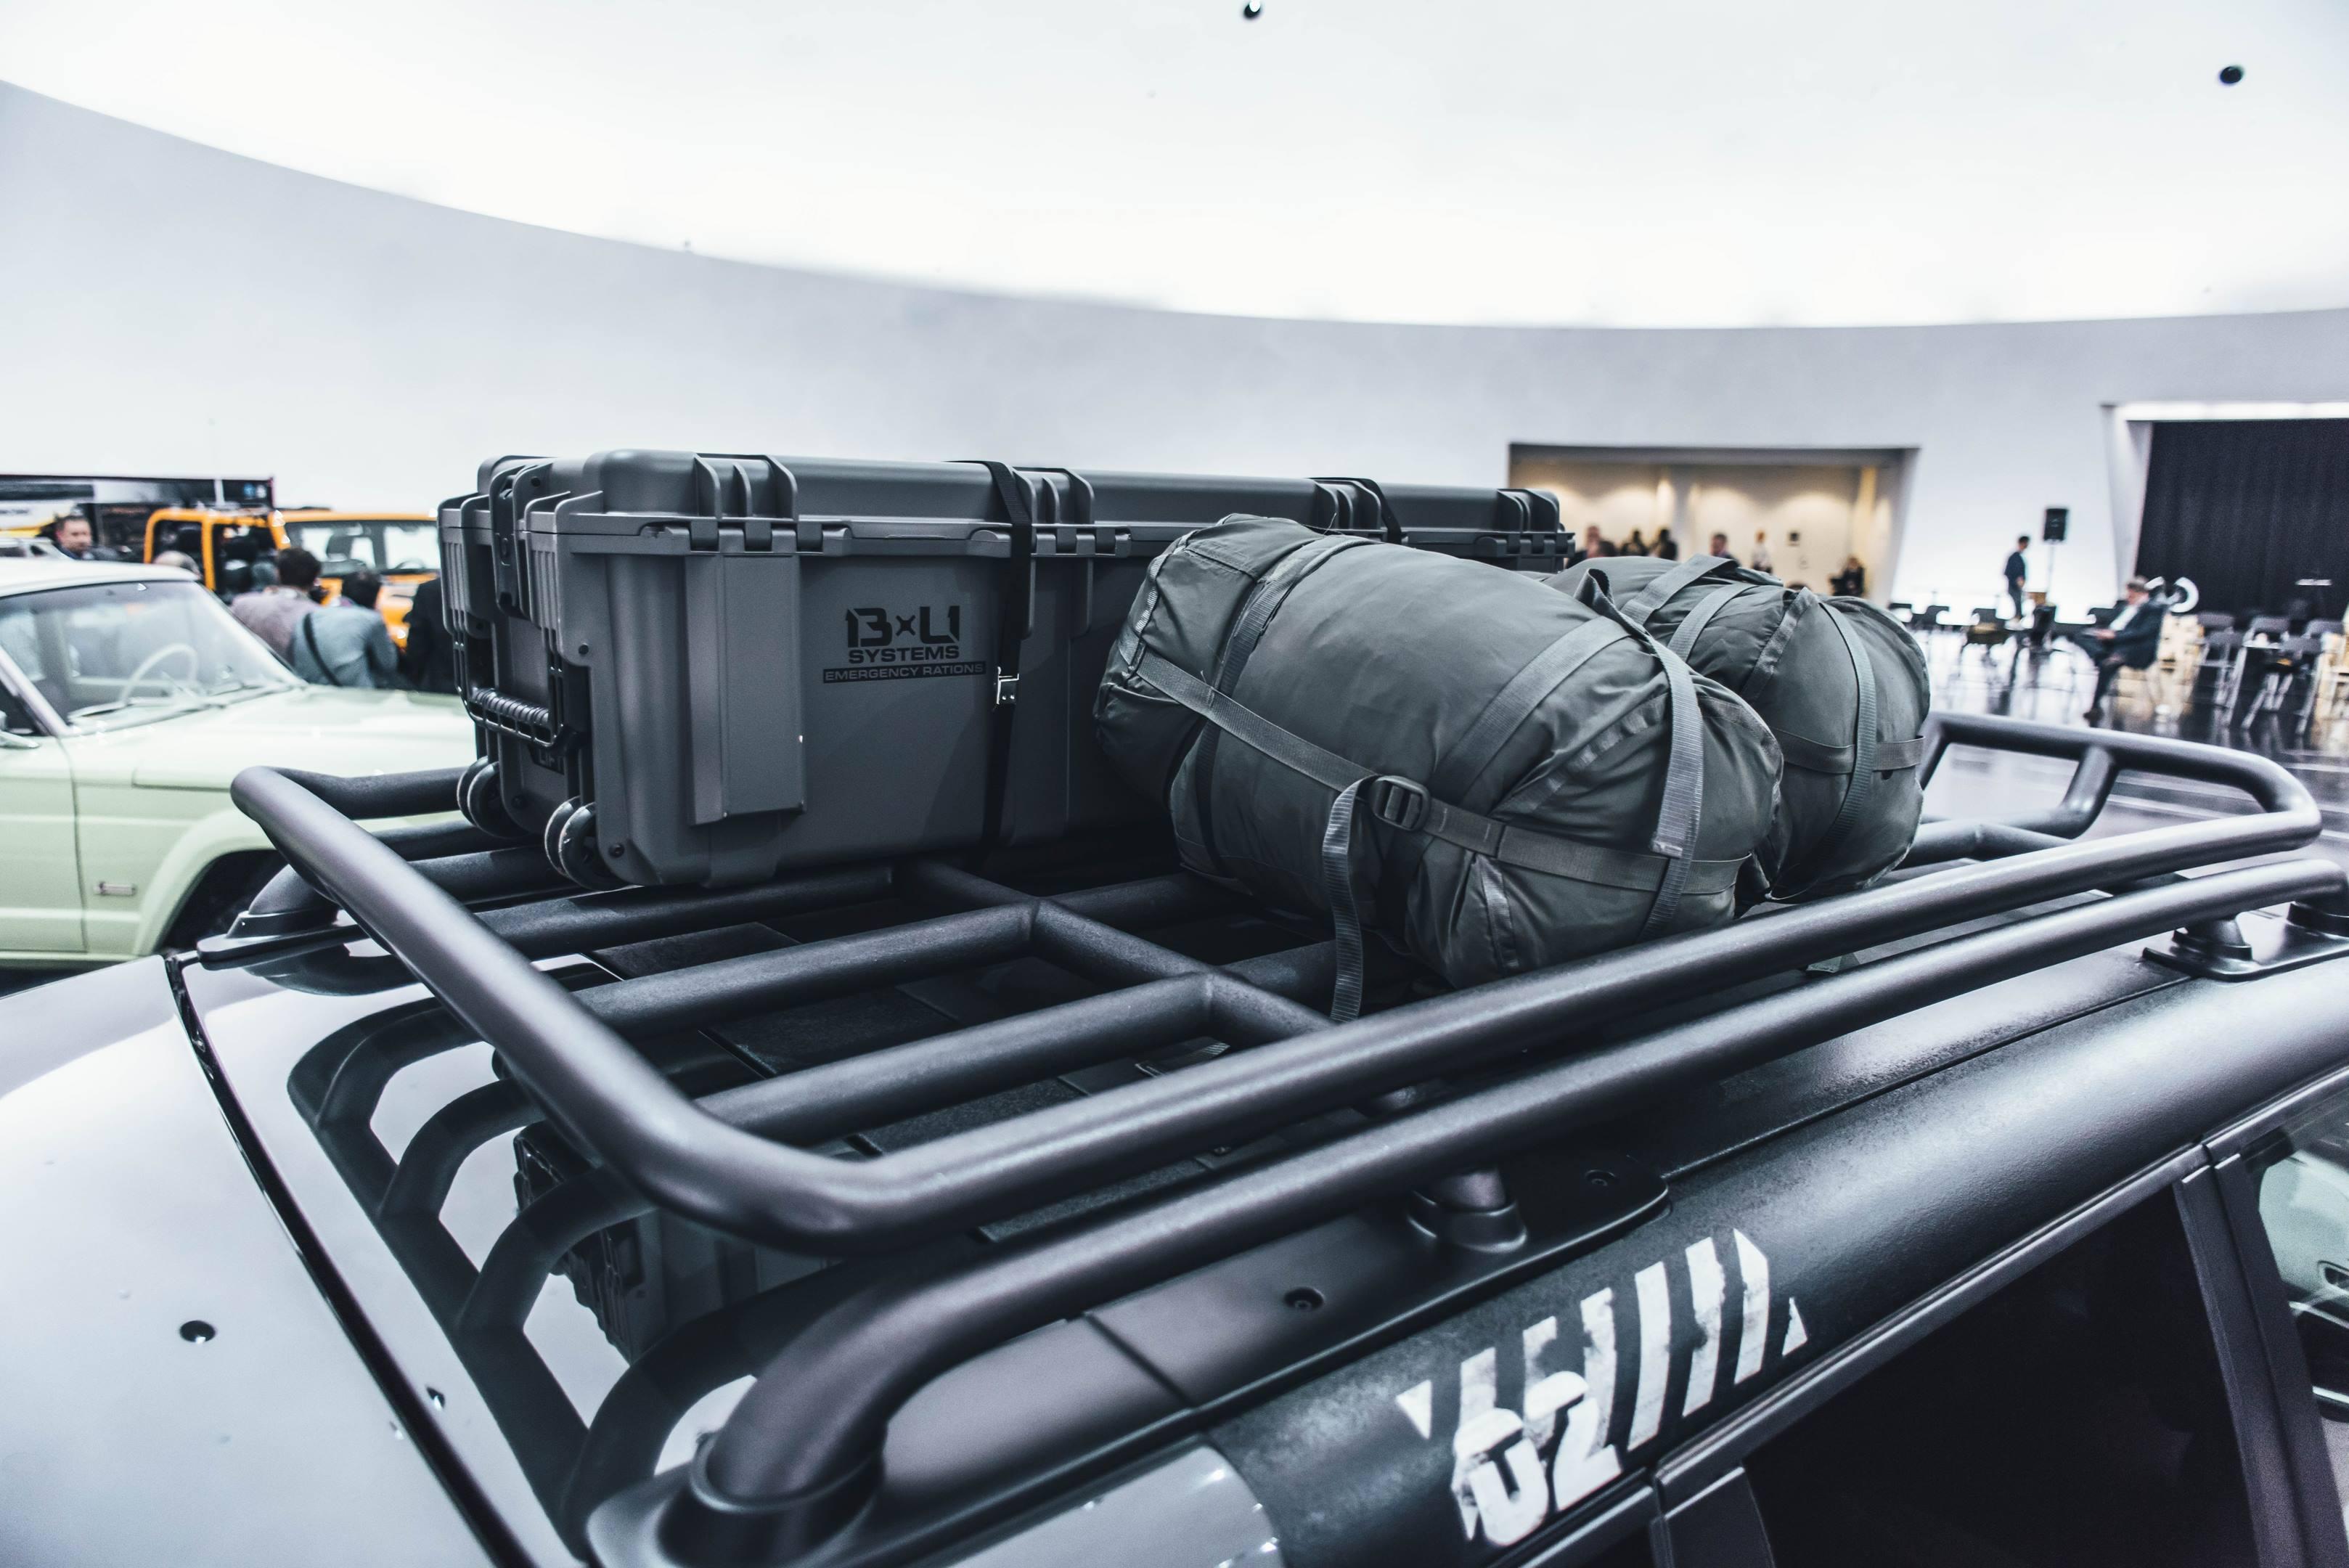 2018 Jeep B-Ute Concept top rack